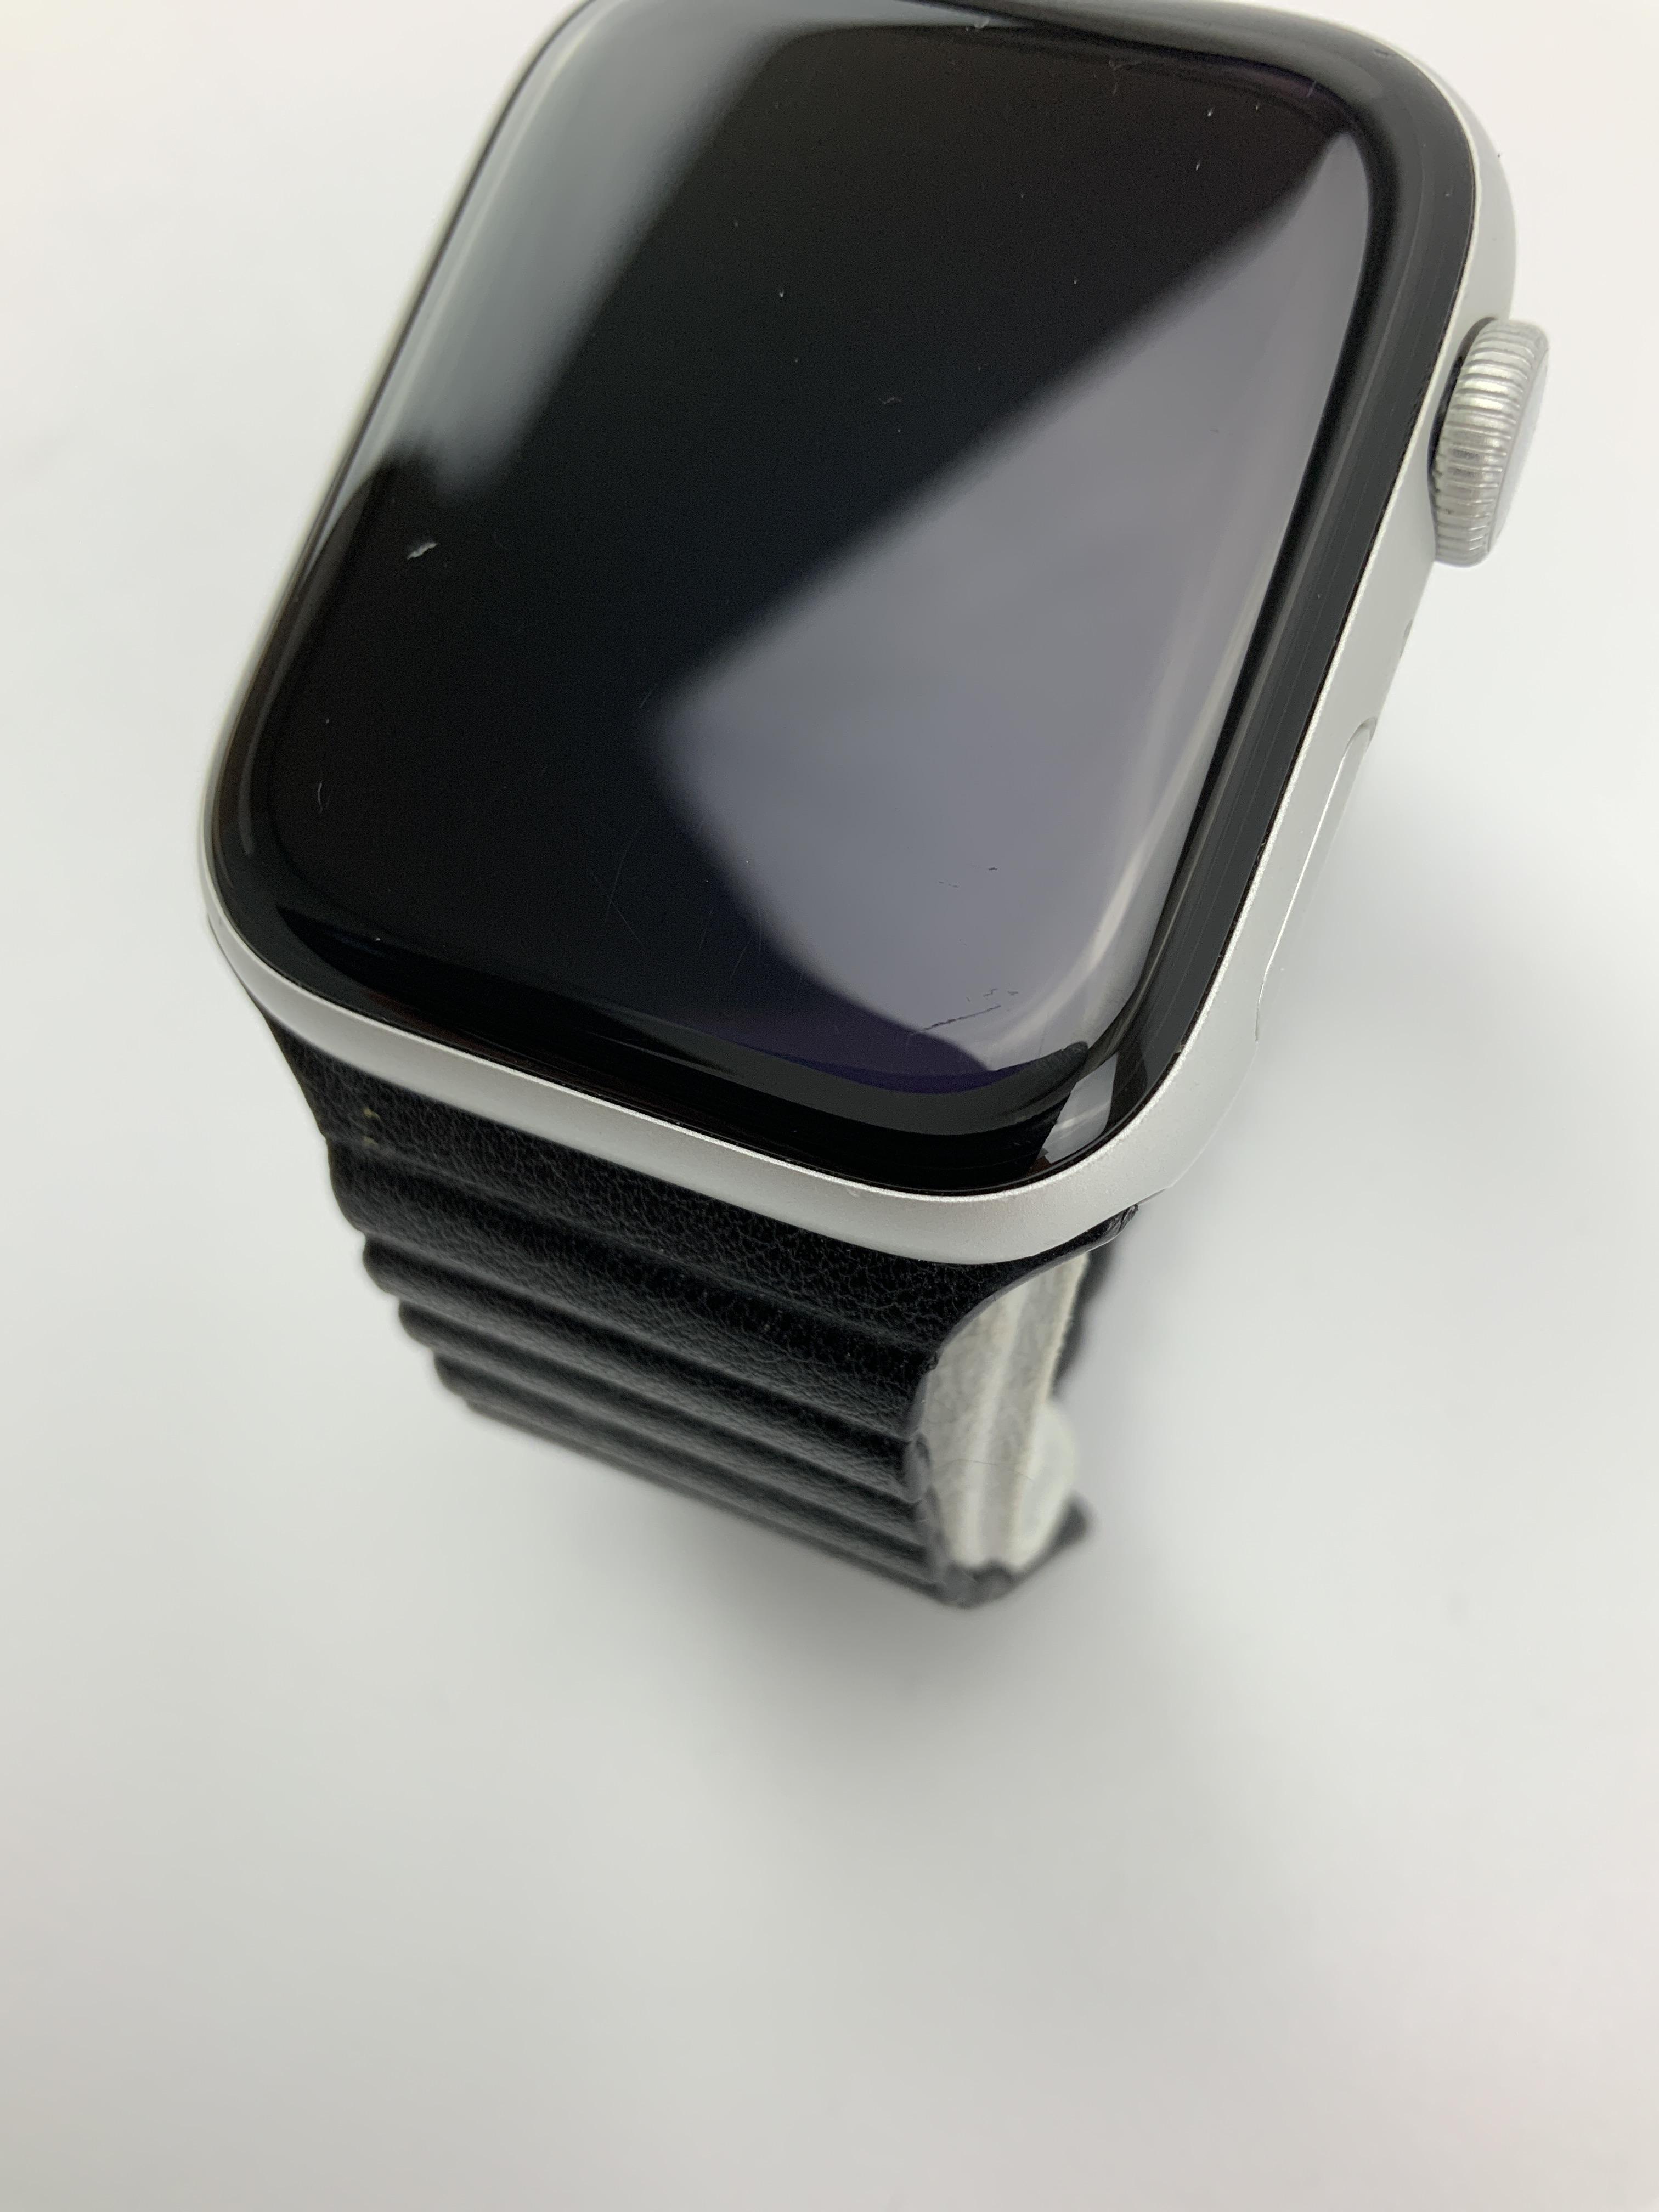 Watch Series 5 Aluminum (44mm), Silver, obraz 4